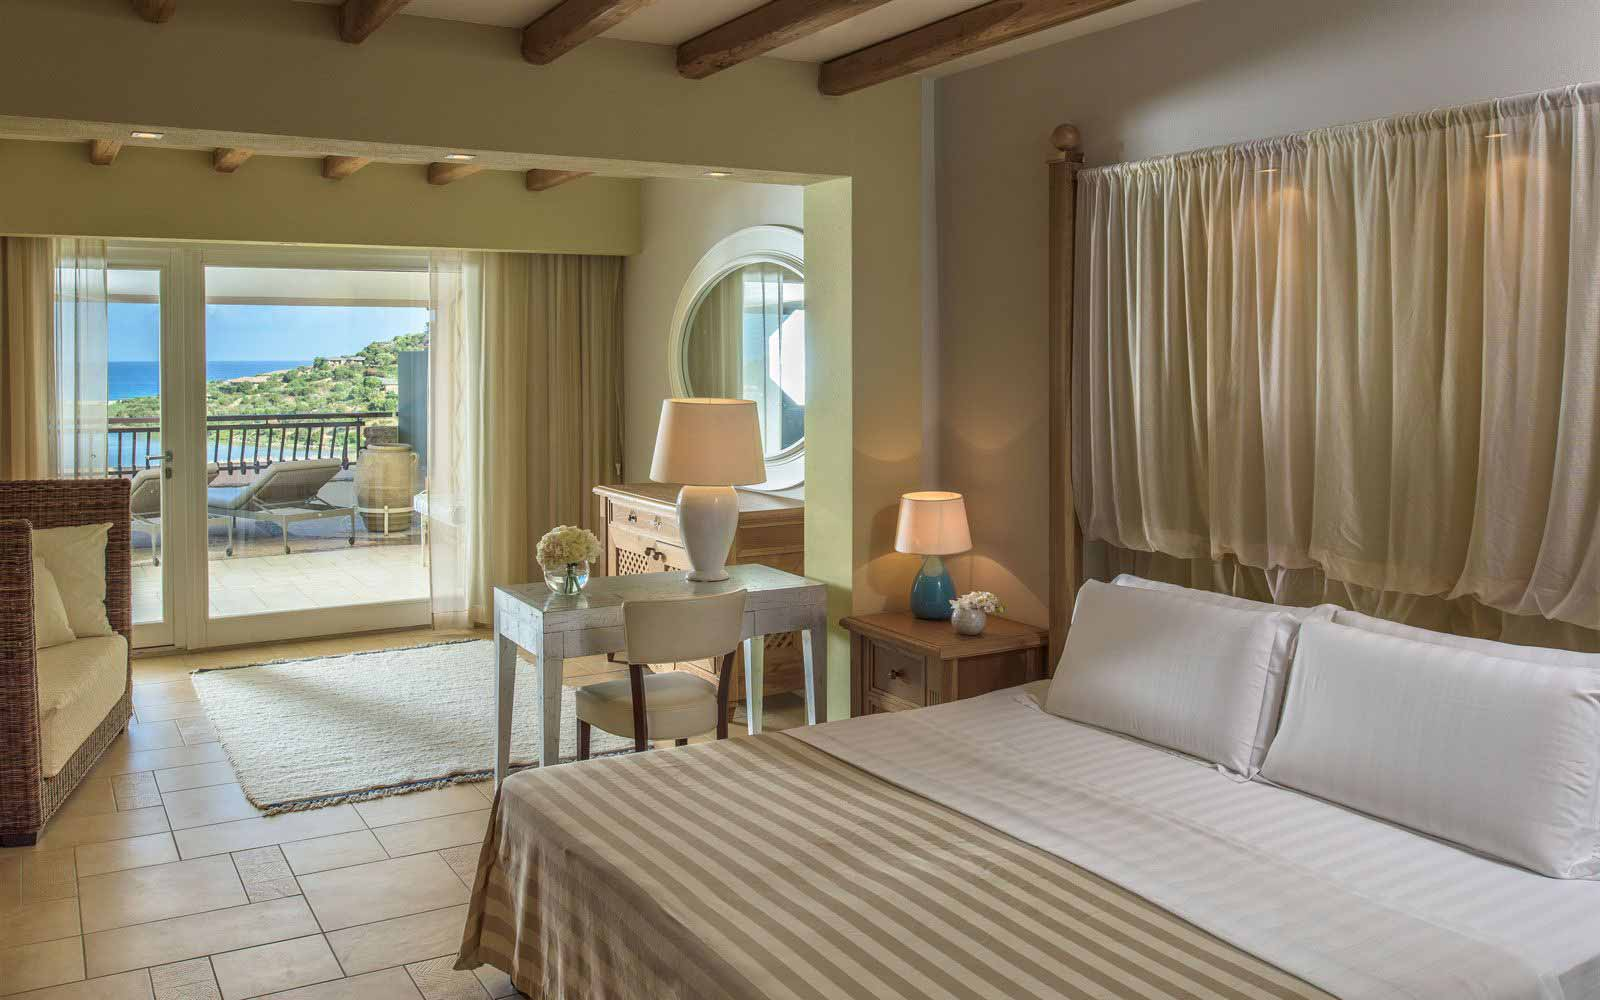 Deluxe room at Hotel Laguna